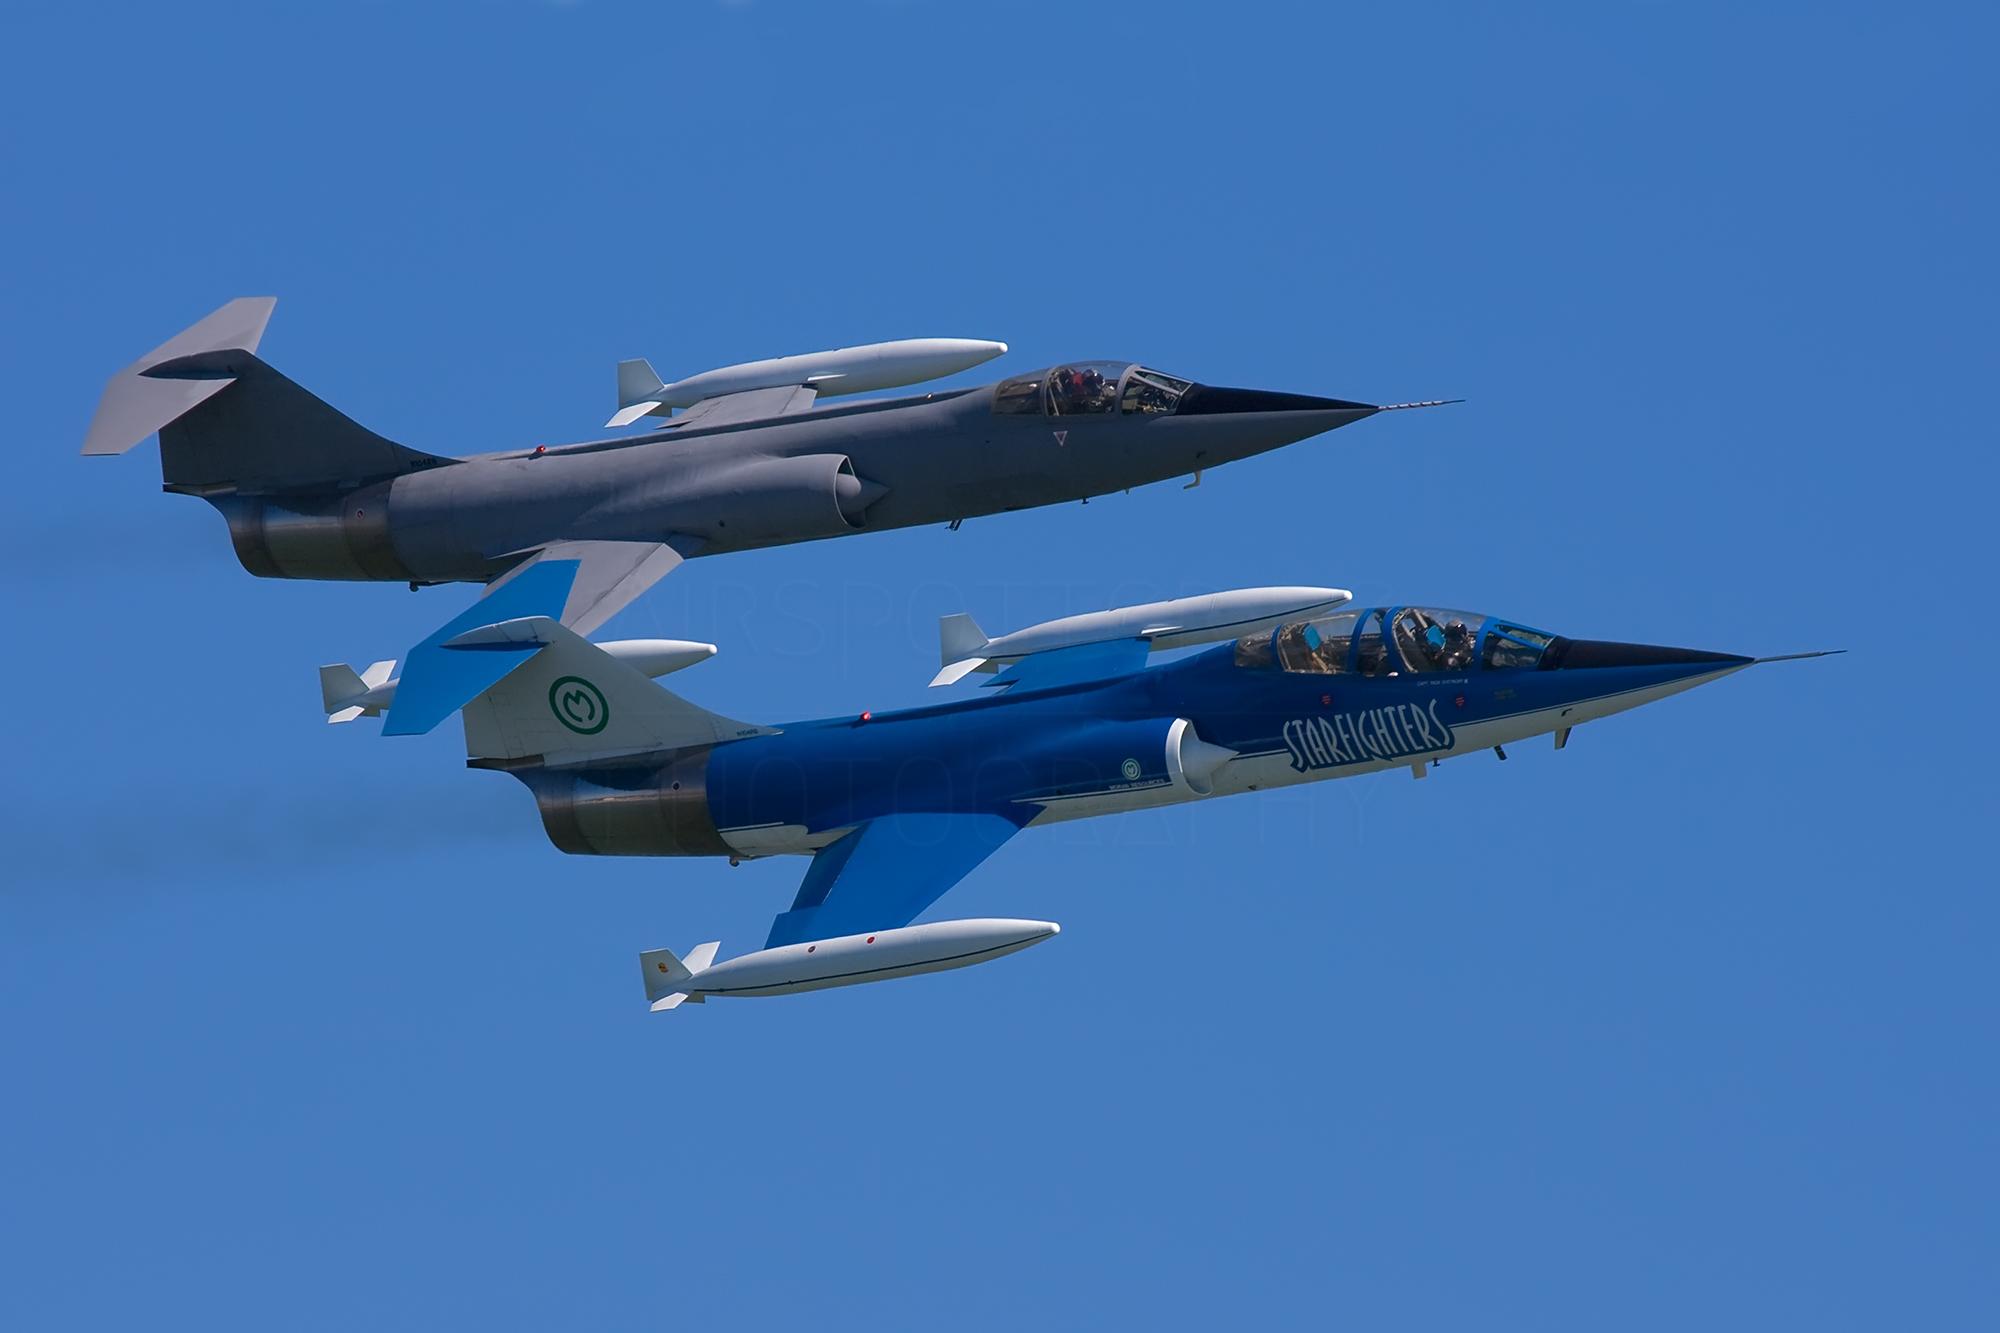 Airspotter.de 2007 Jacksonville Beach Starfighter F-104 dou